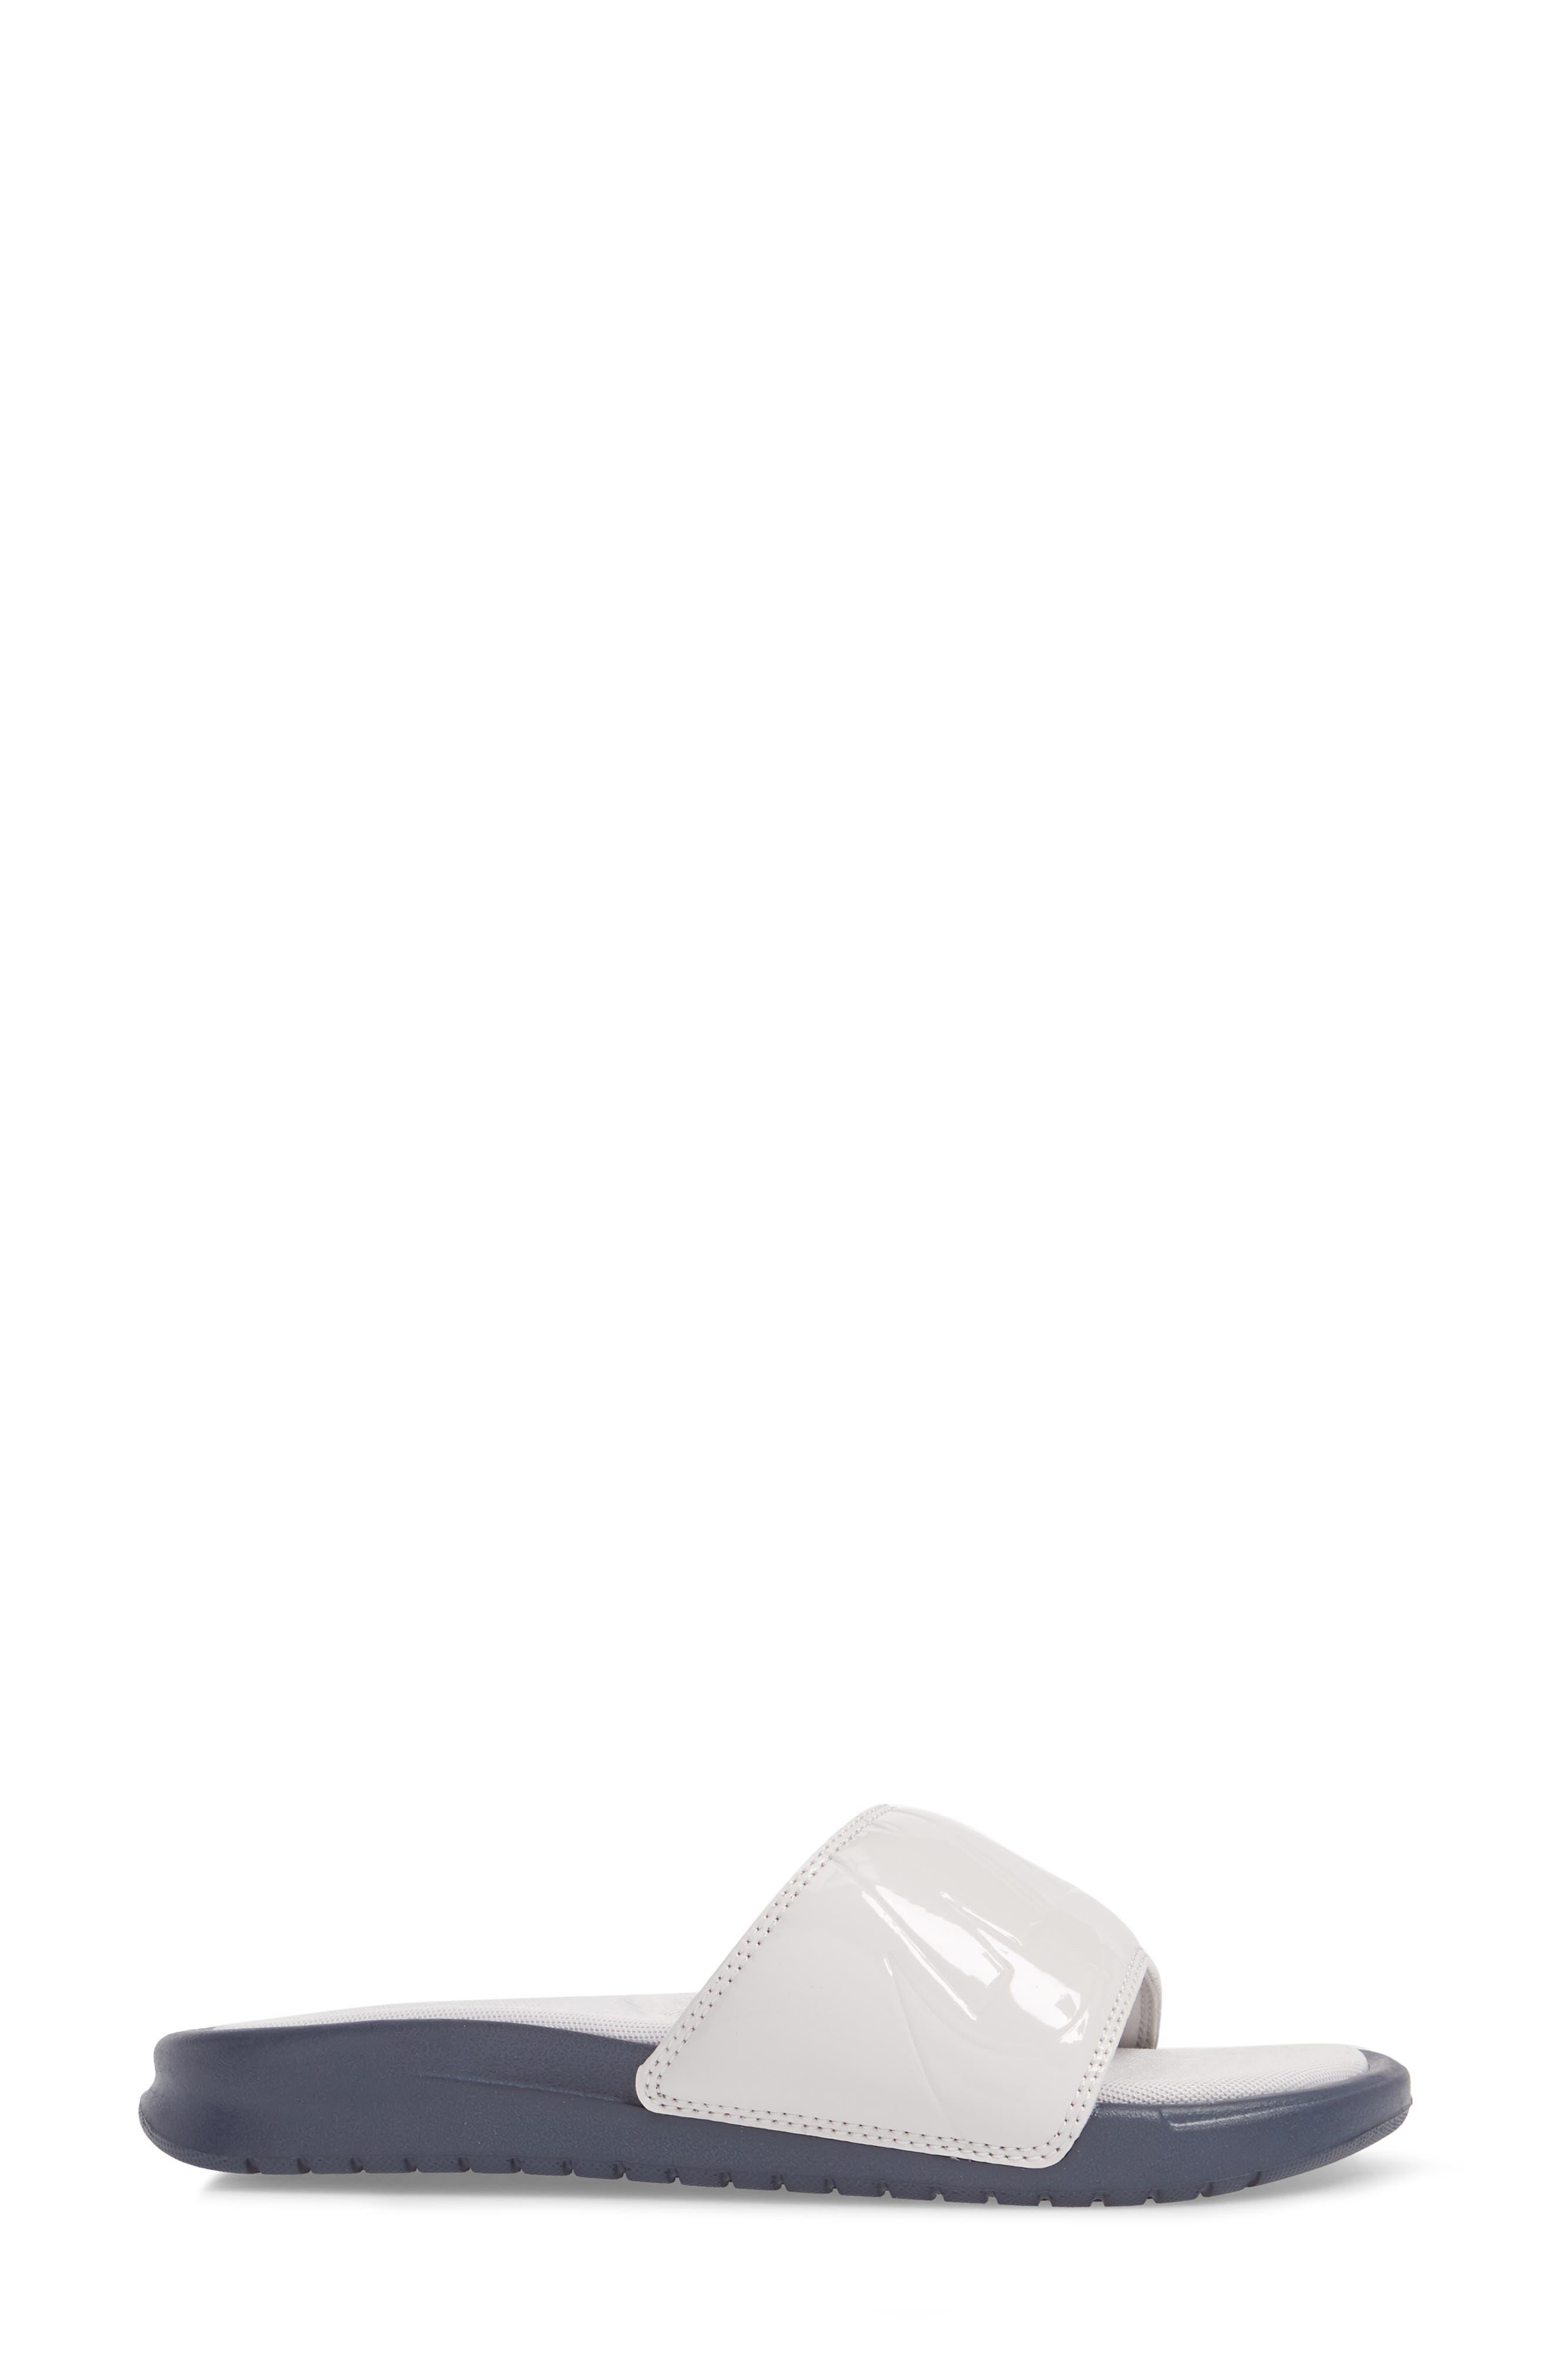 Benassi JDI Ultra Sport Slide,                             Alternate thumbnail 3, color,                             VAST GREY/ VAST GREY/ OBSIDIAN